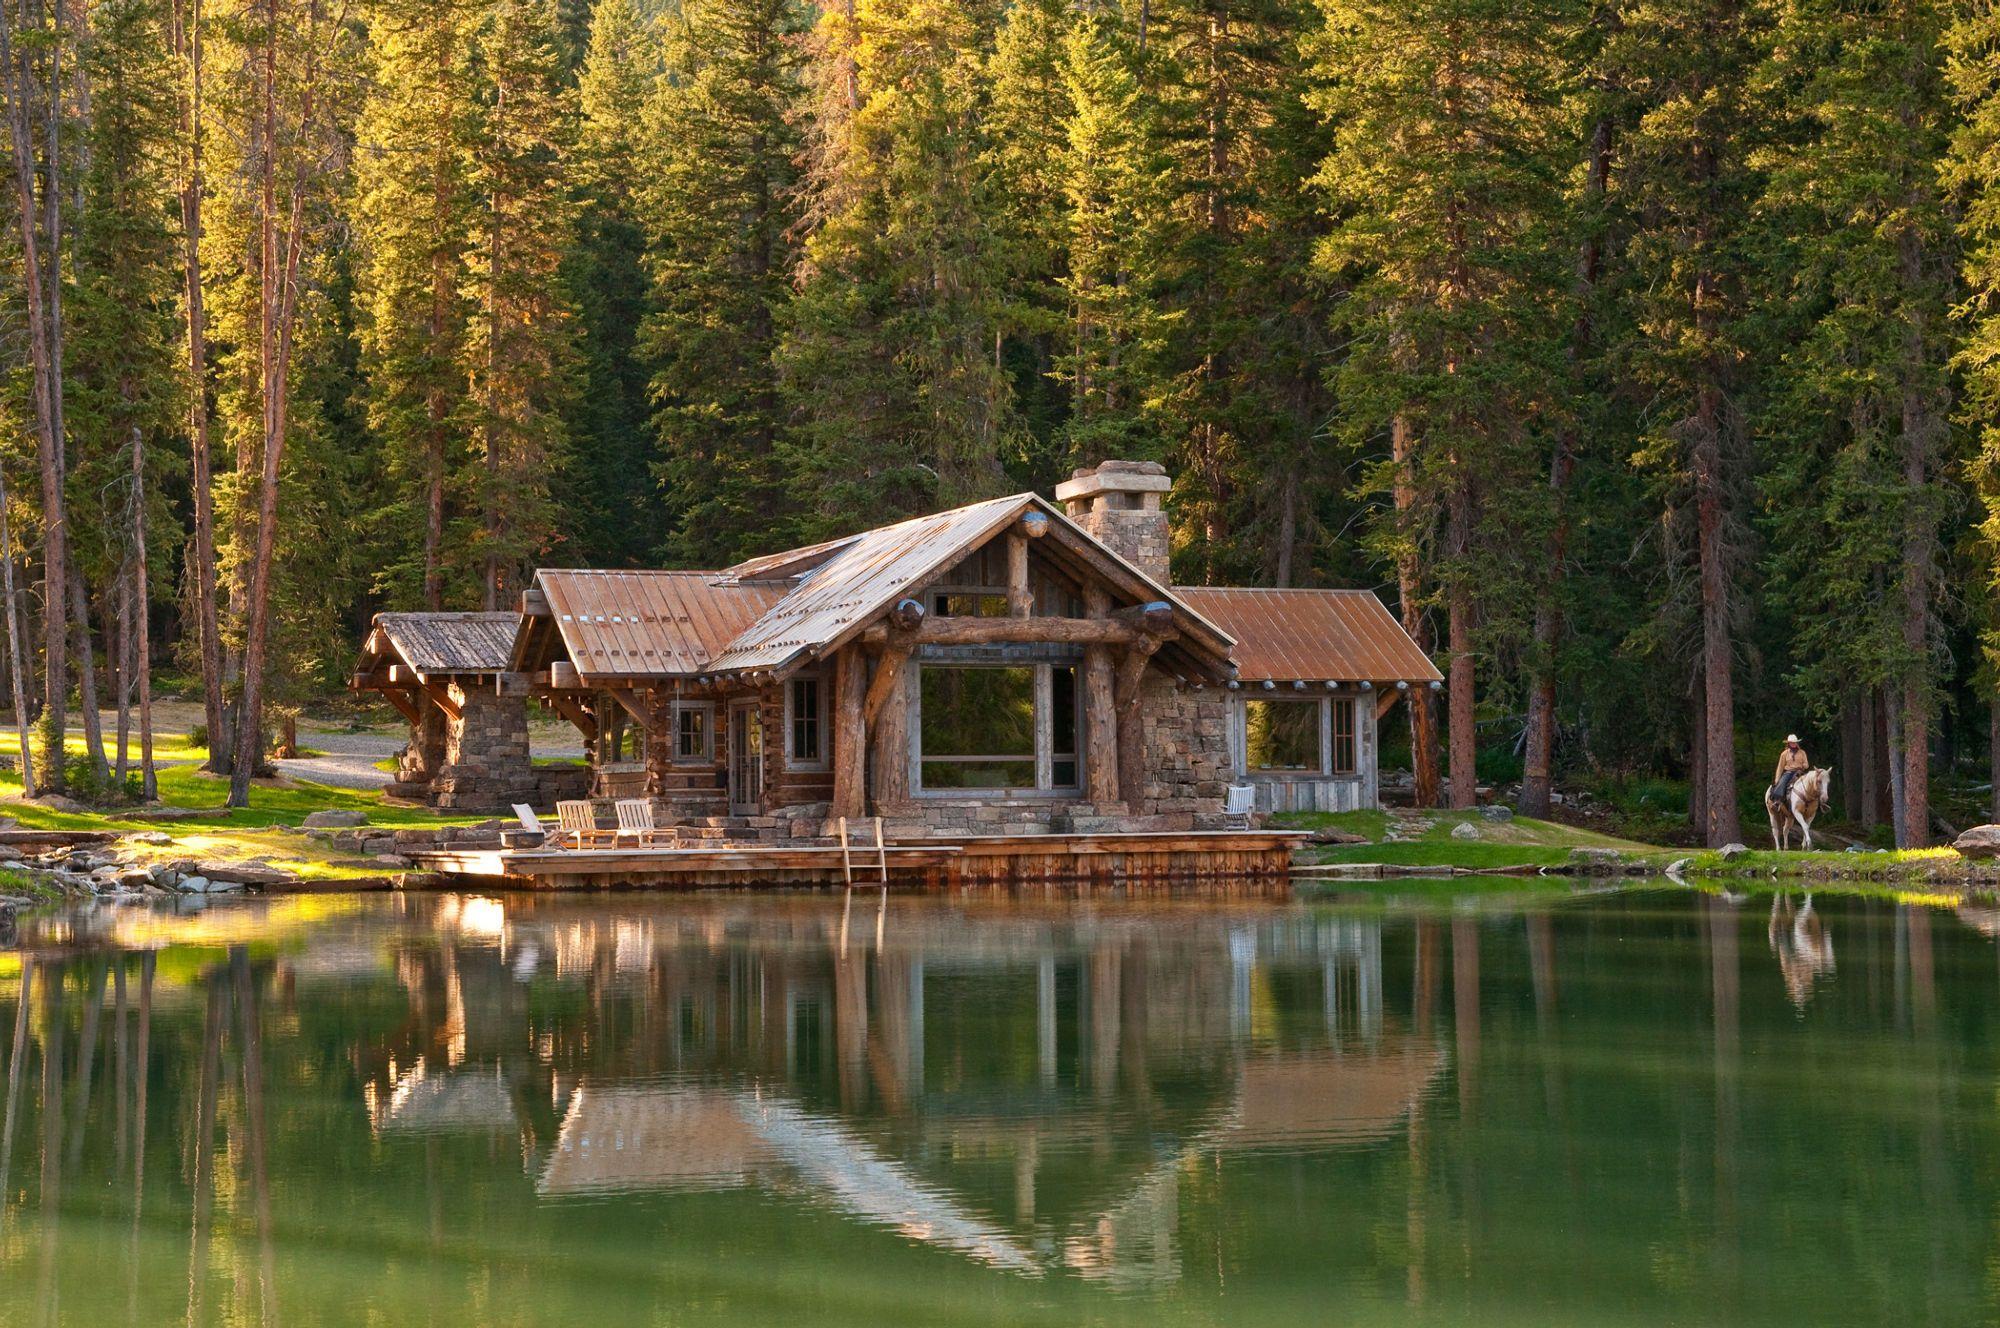 Headwaters Camp Cabin in Big Sky Montana